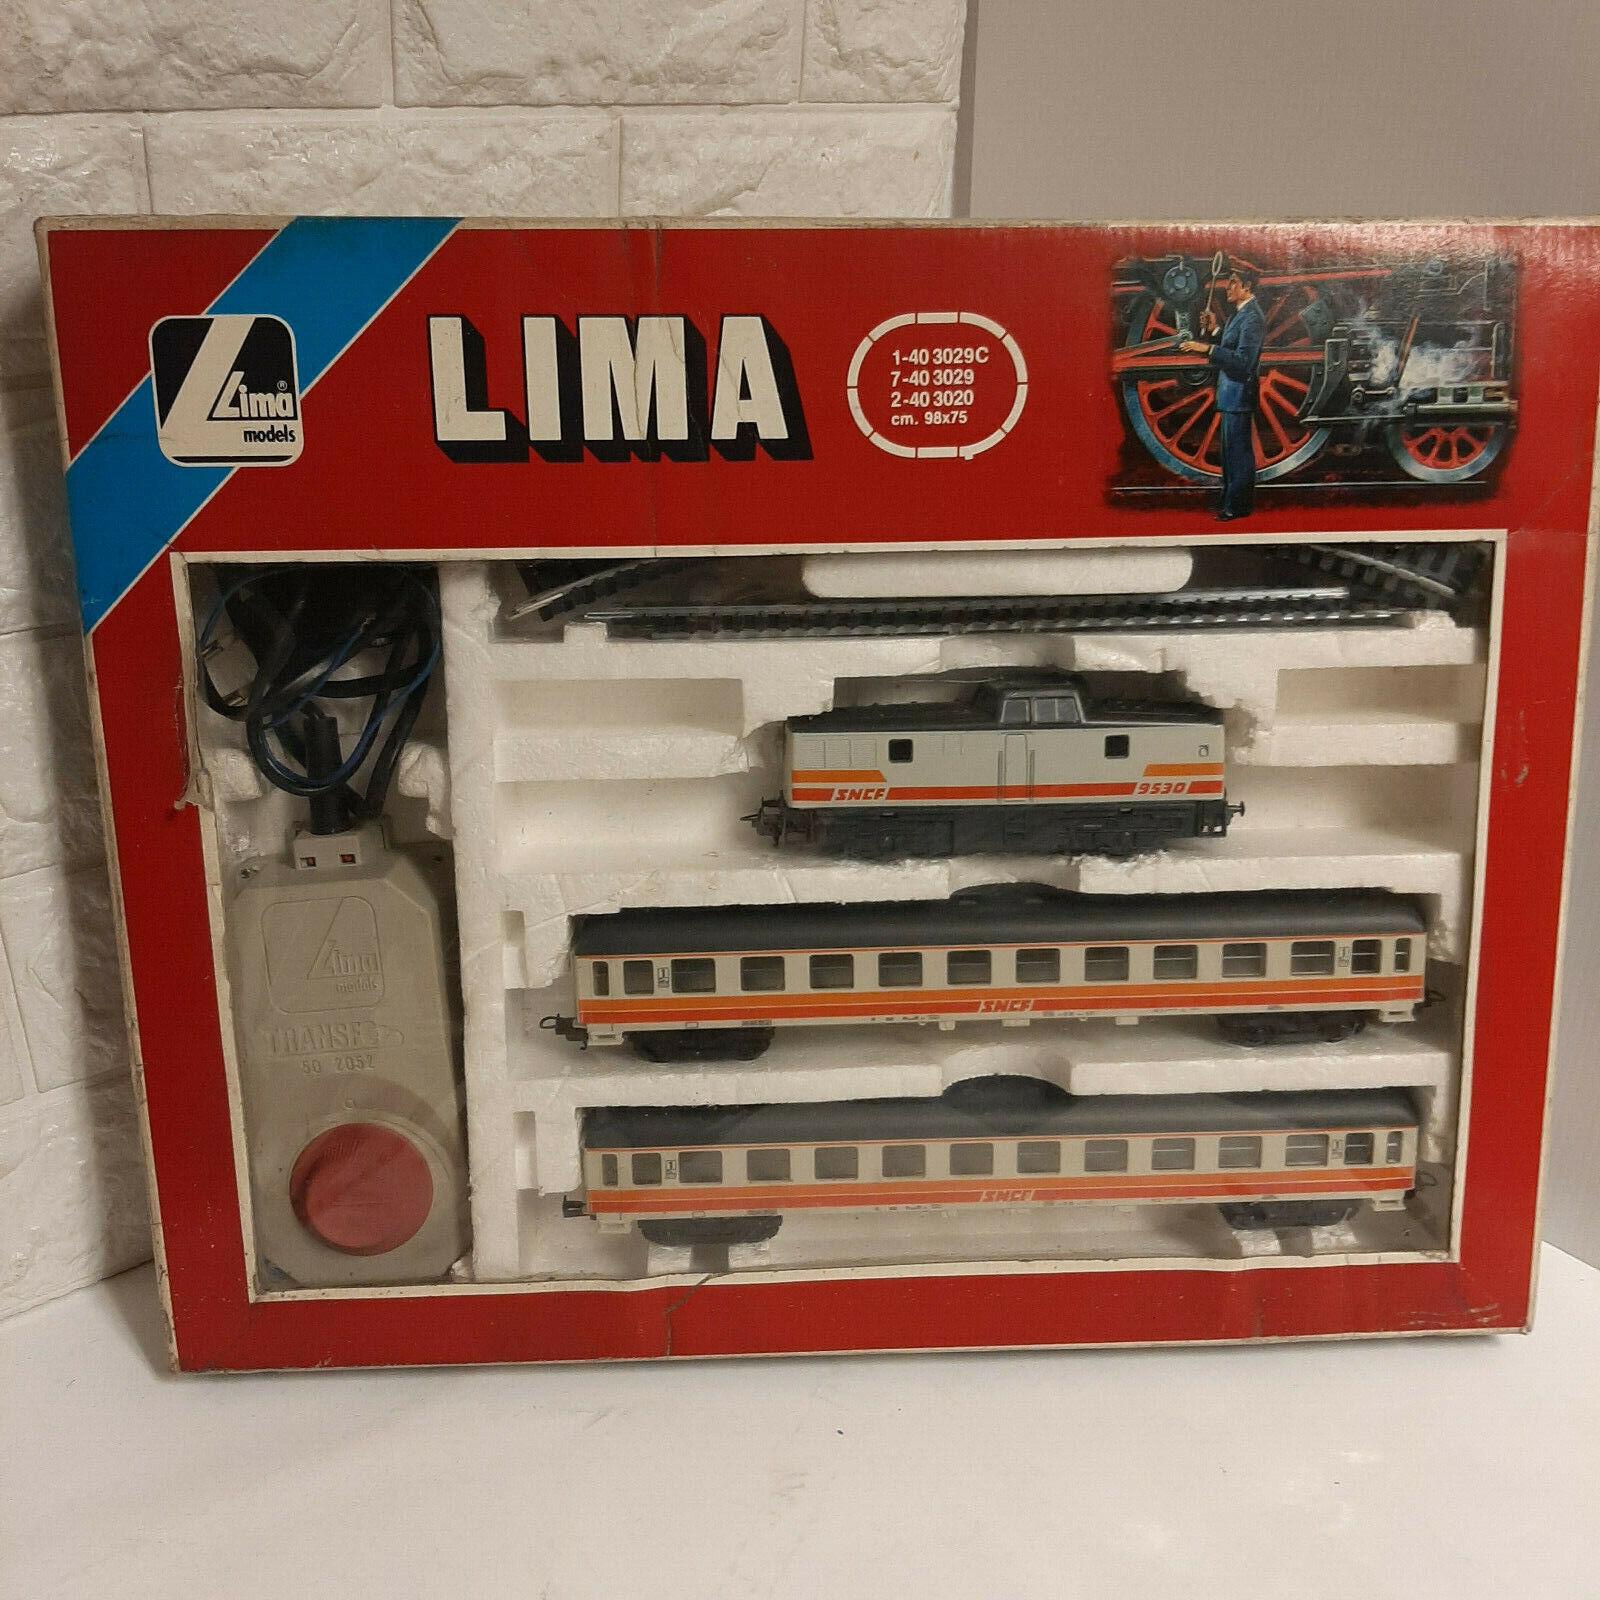 LIMA 103400T Sncf 9530 Scala H0